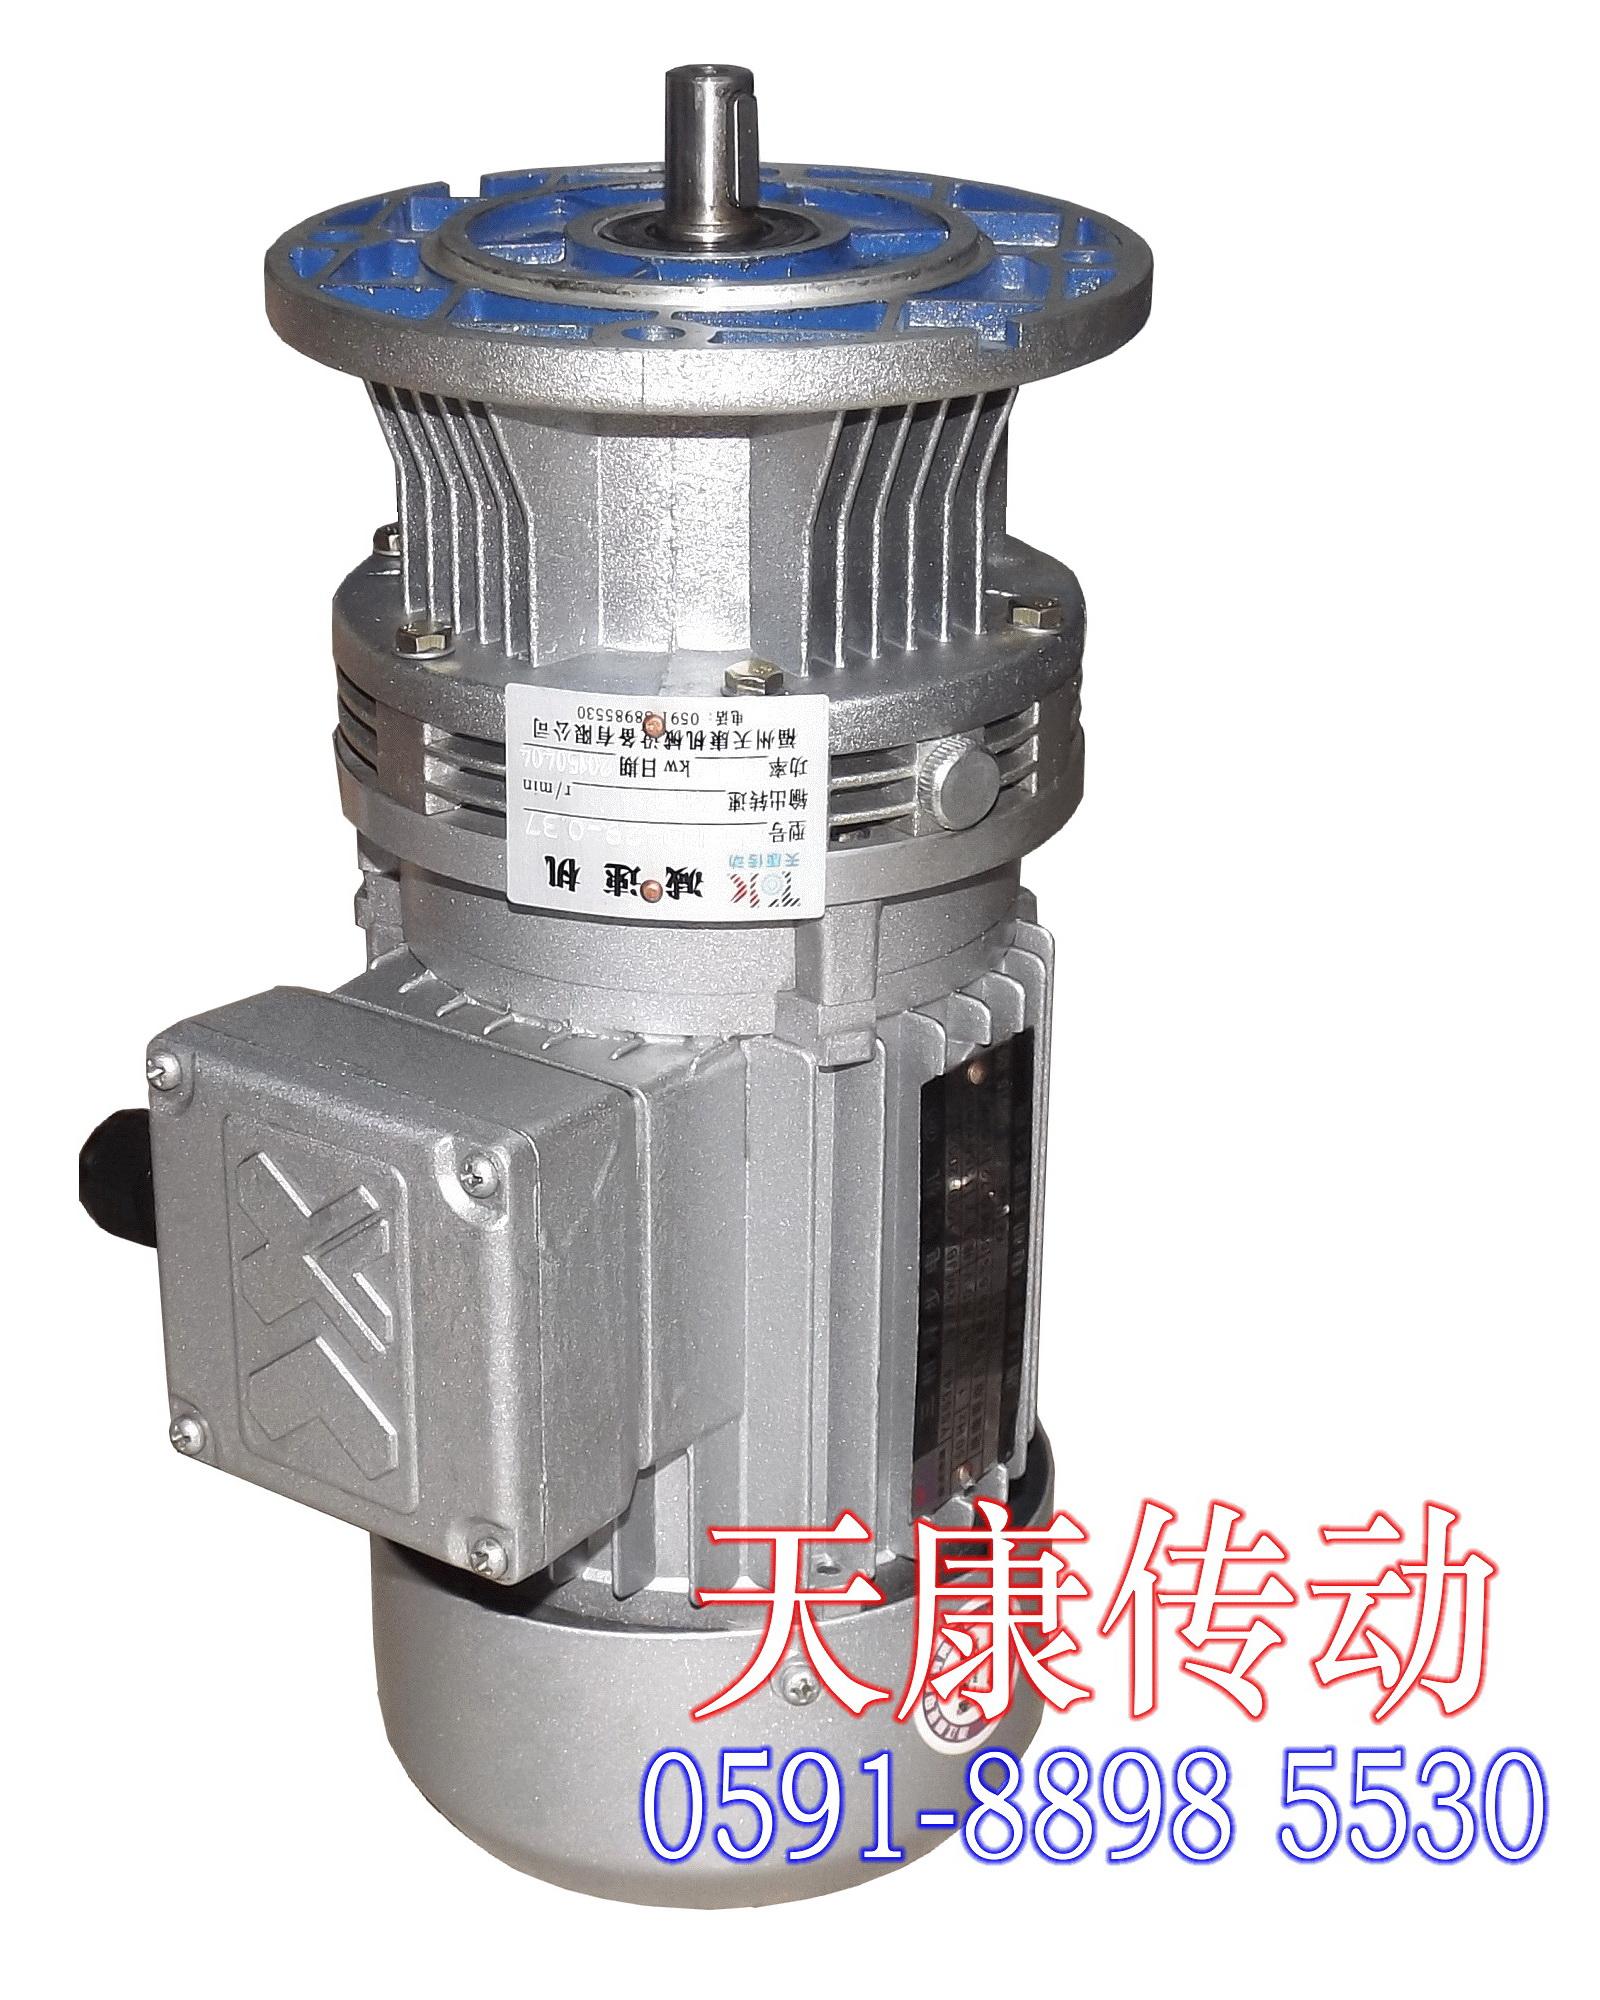 WBWD微型擺線減速機1